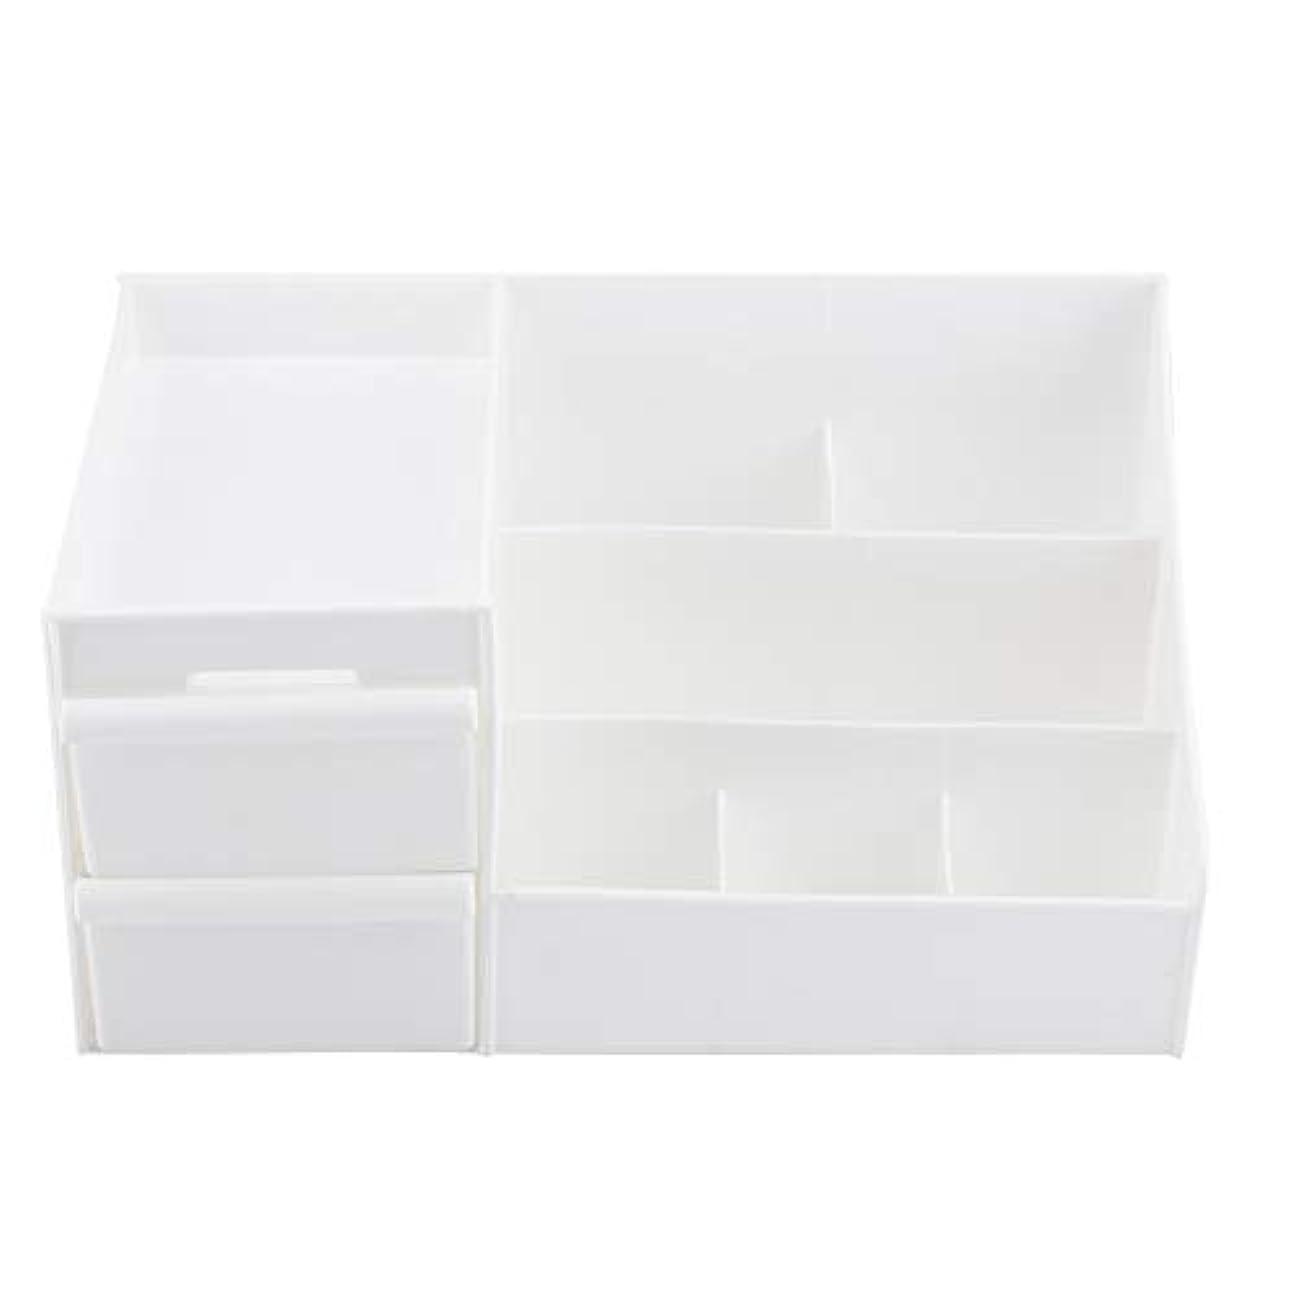 xuuyuu 化粧品収納ボックス コスメボックス メイクボックス メイクケース コスメ収納スタンド ジュエリーボックス 引き出し 小物/化粧品入れ 化粧品 収納 引き出し小物 (ホワイト)